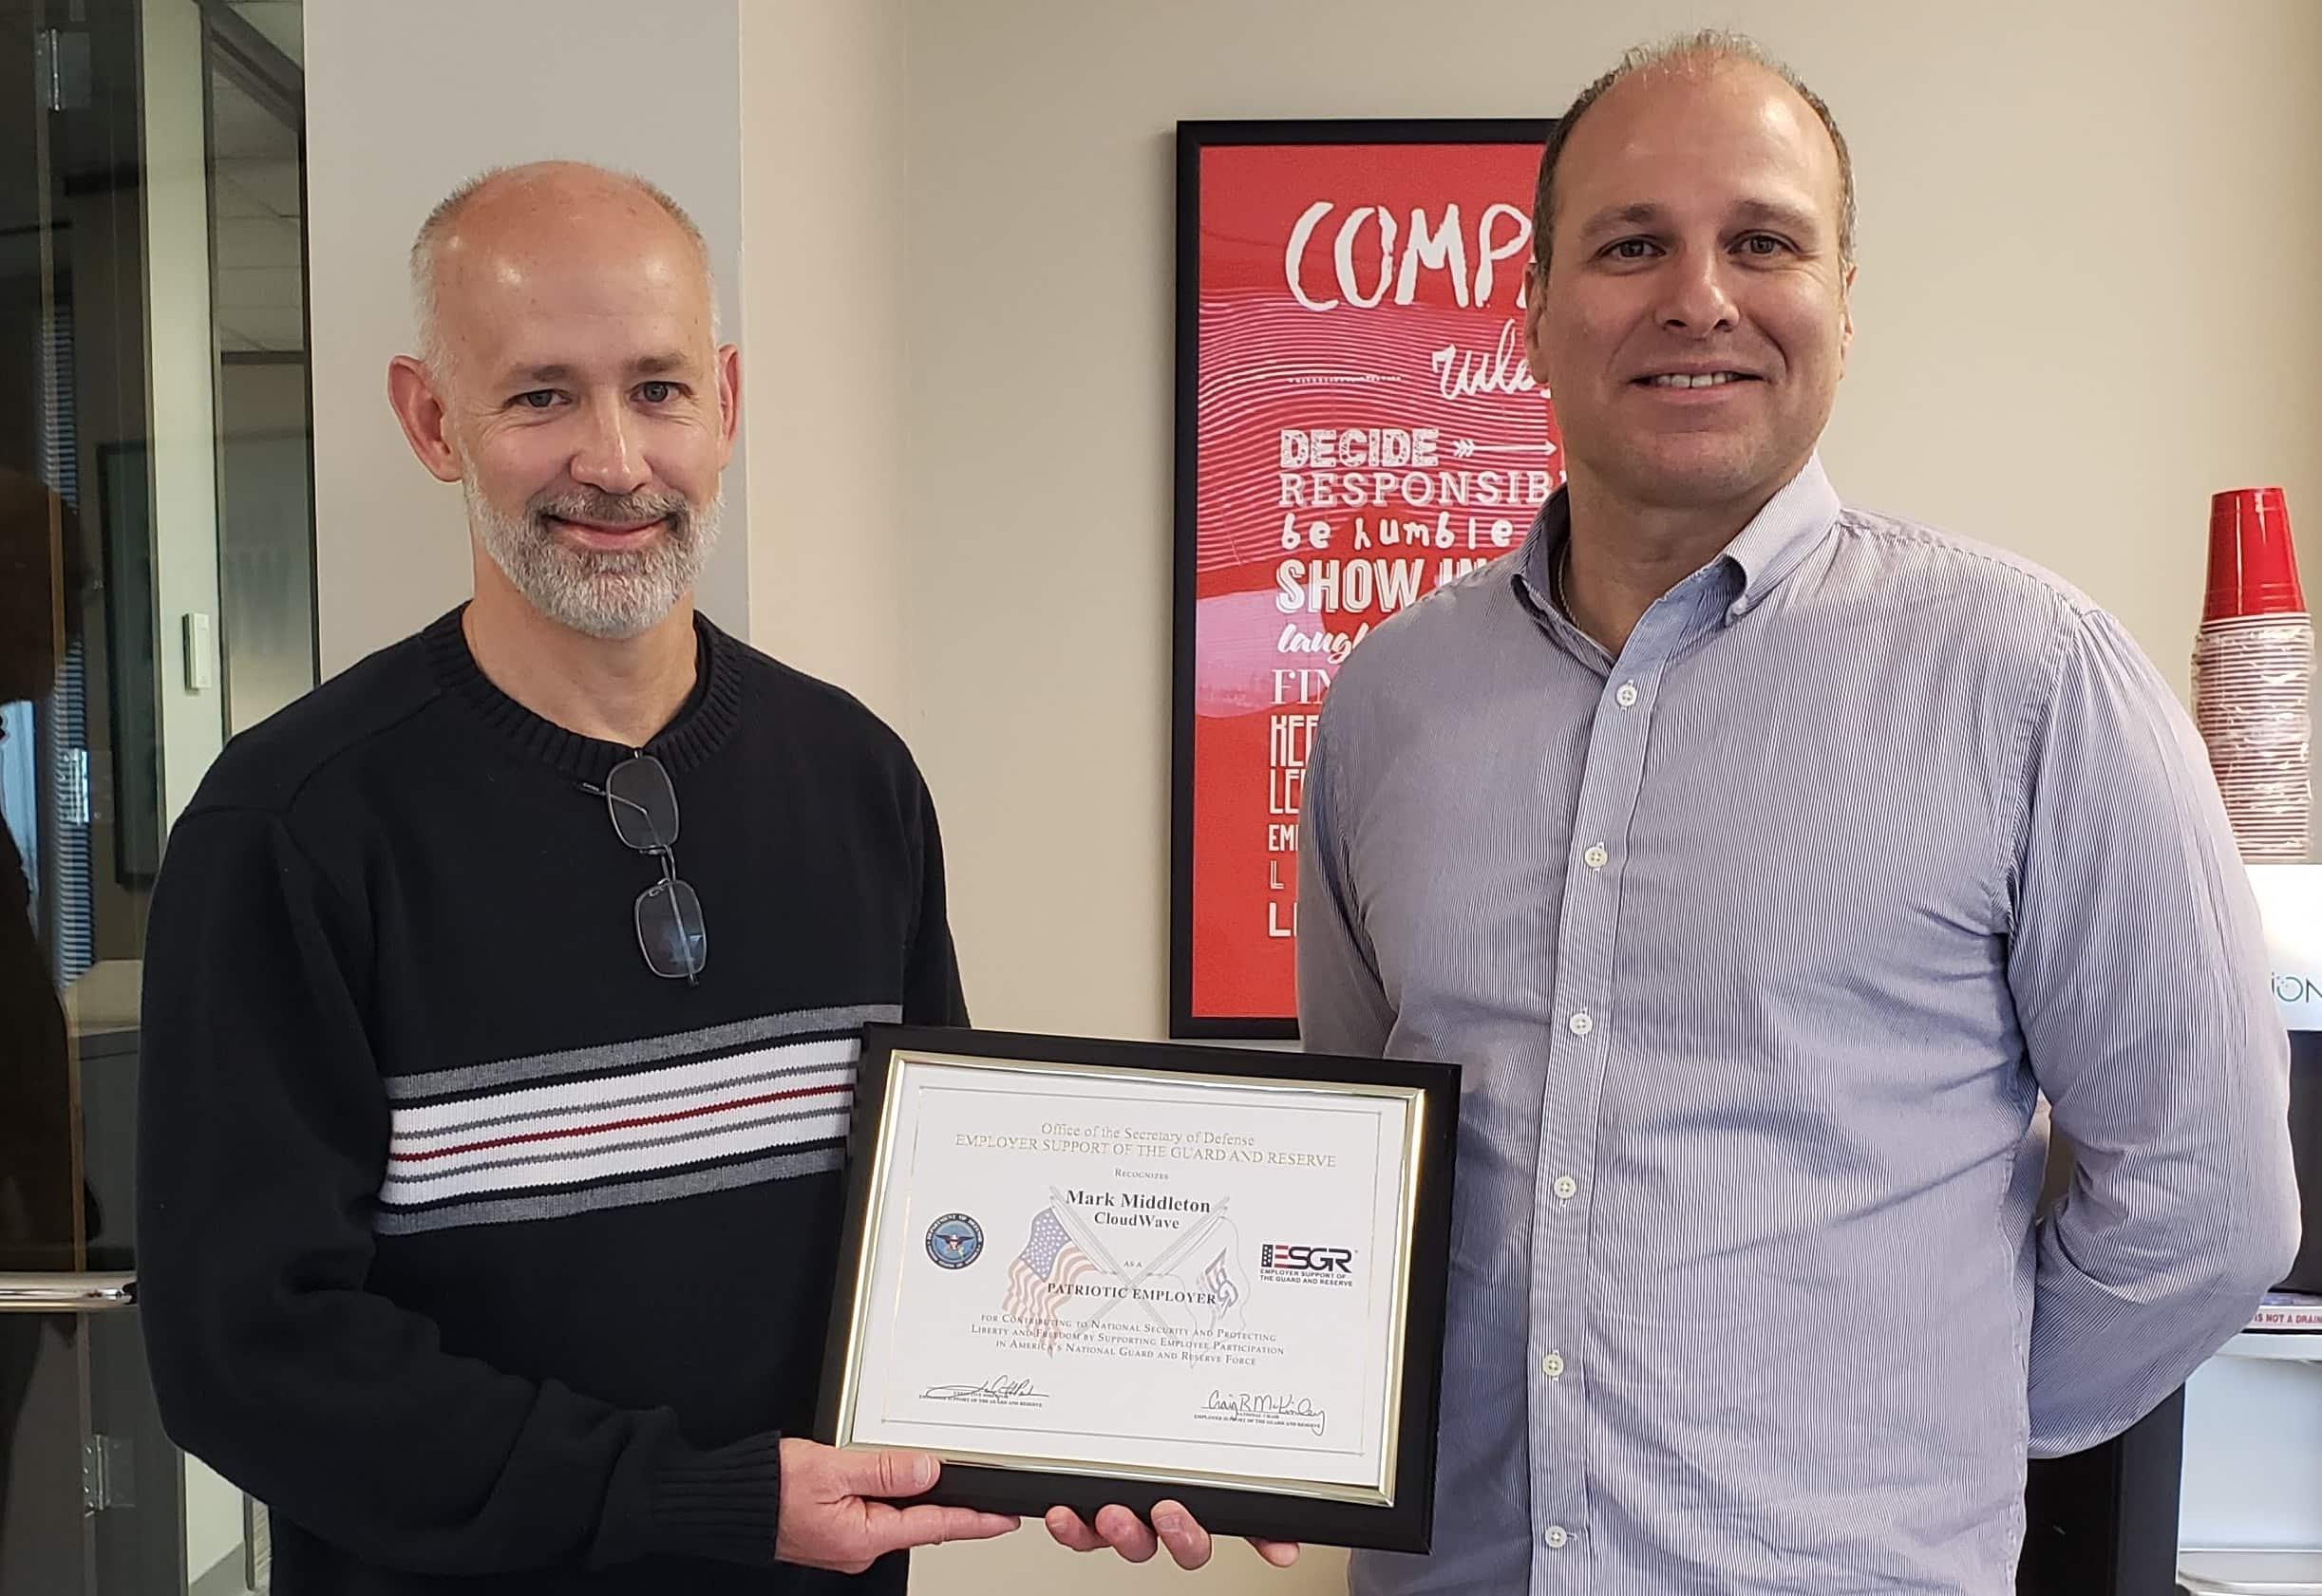 https://www.gocloudwave.com/wp-content/uploads/2019/07/Patriot-Award-min.jpg